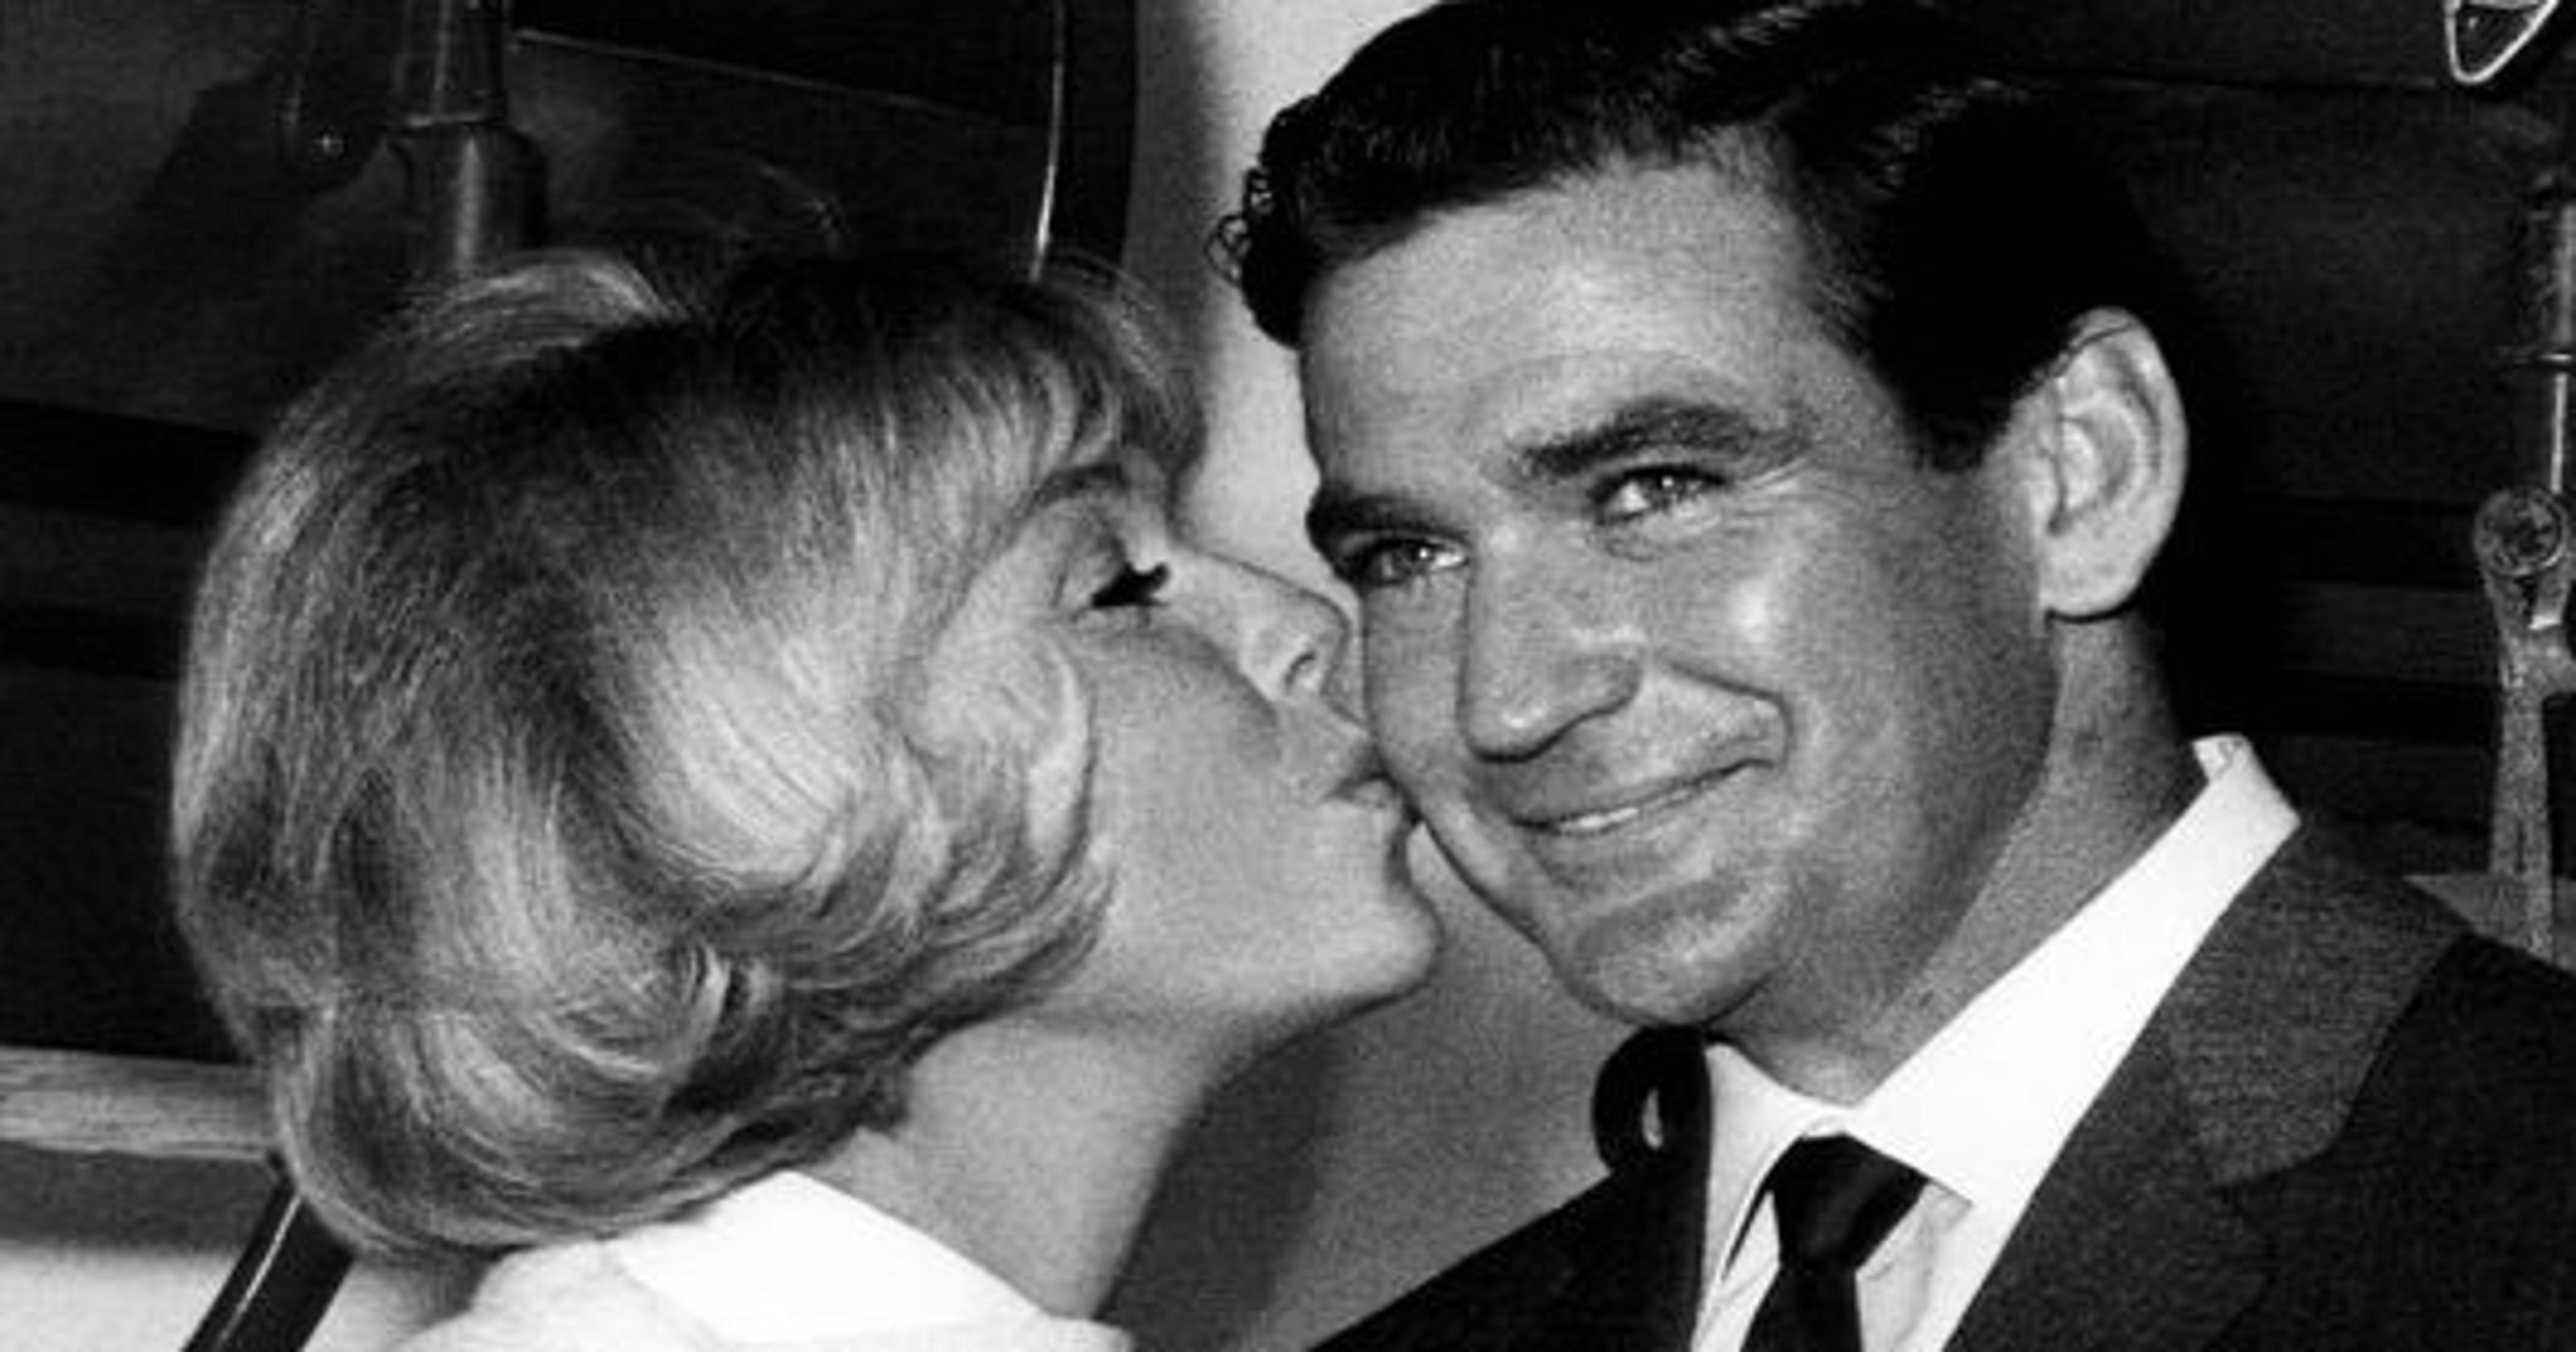 actor rod taylor dies at 84